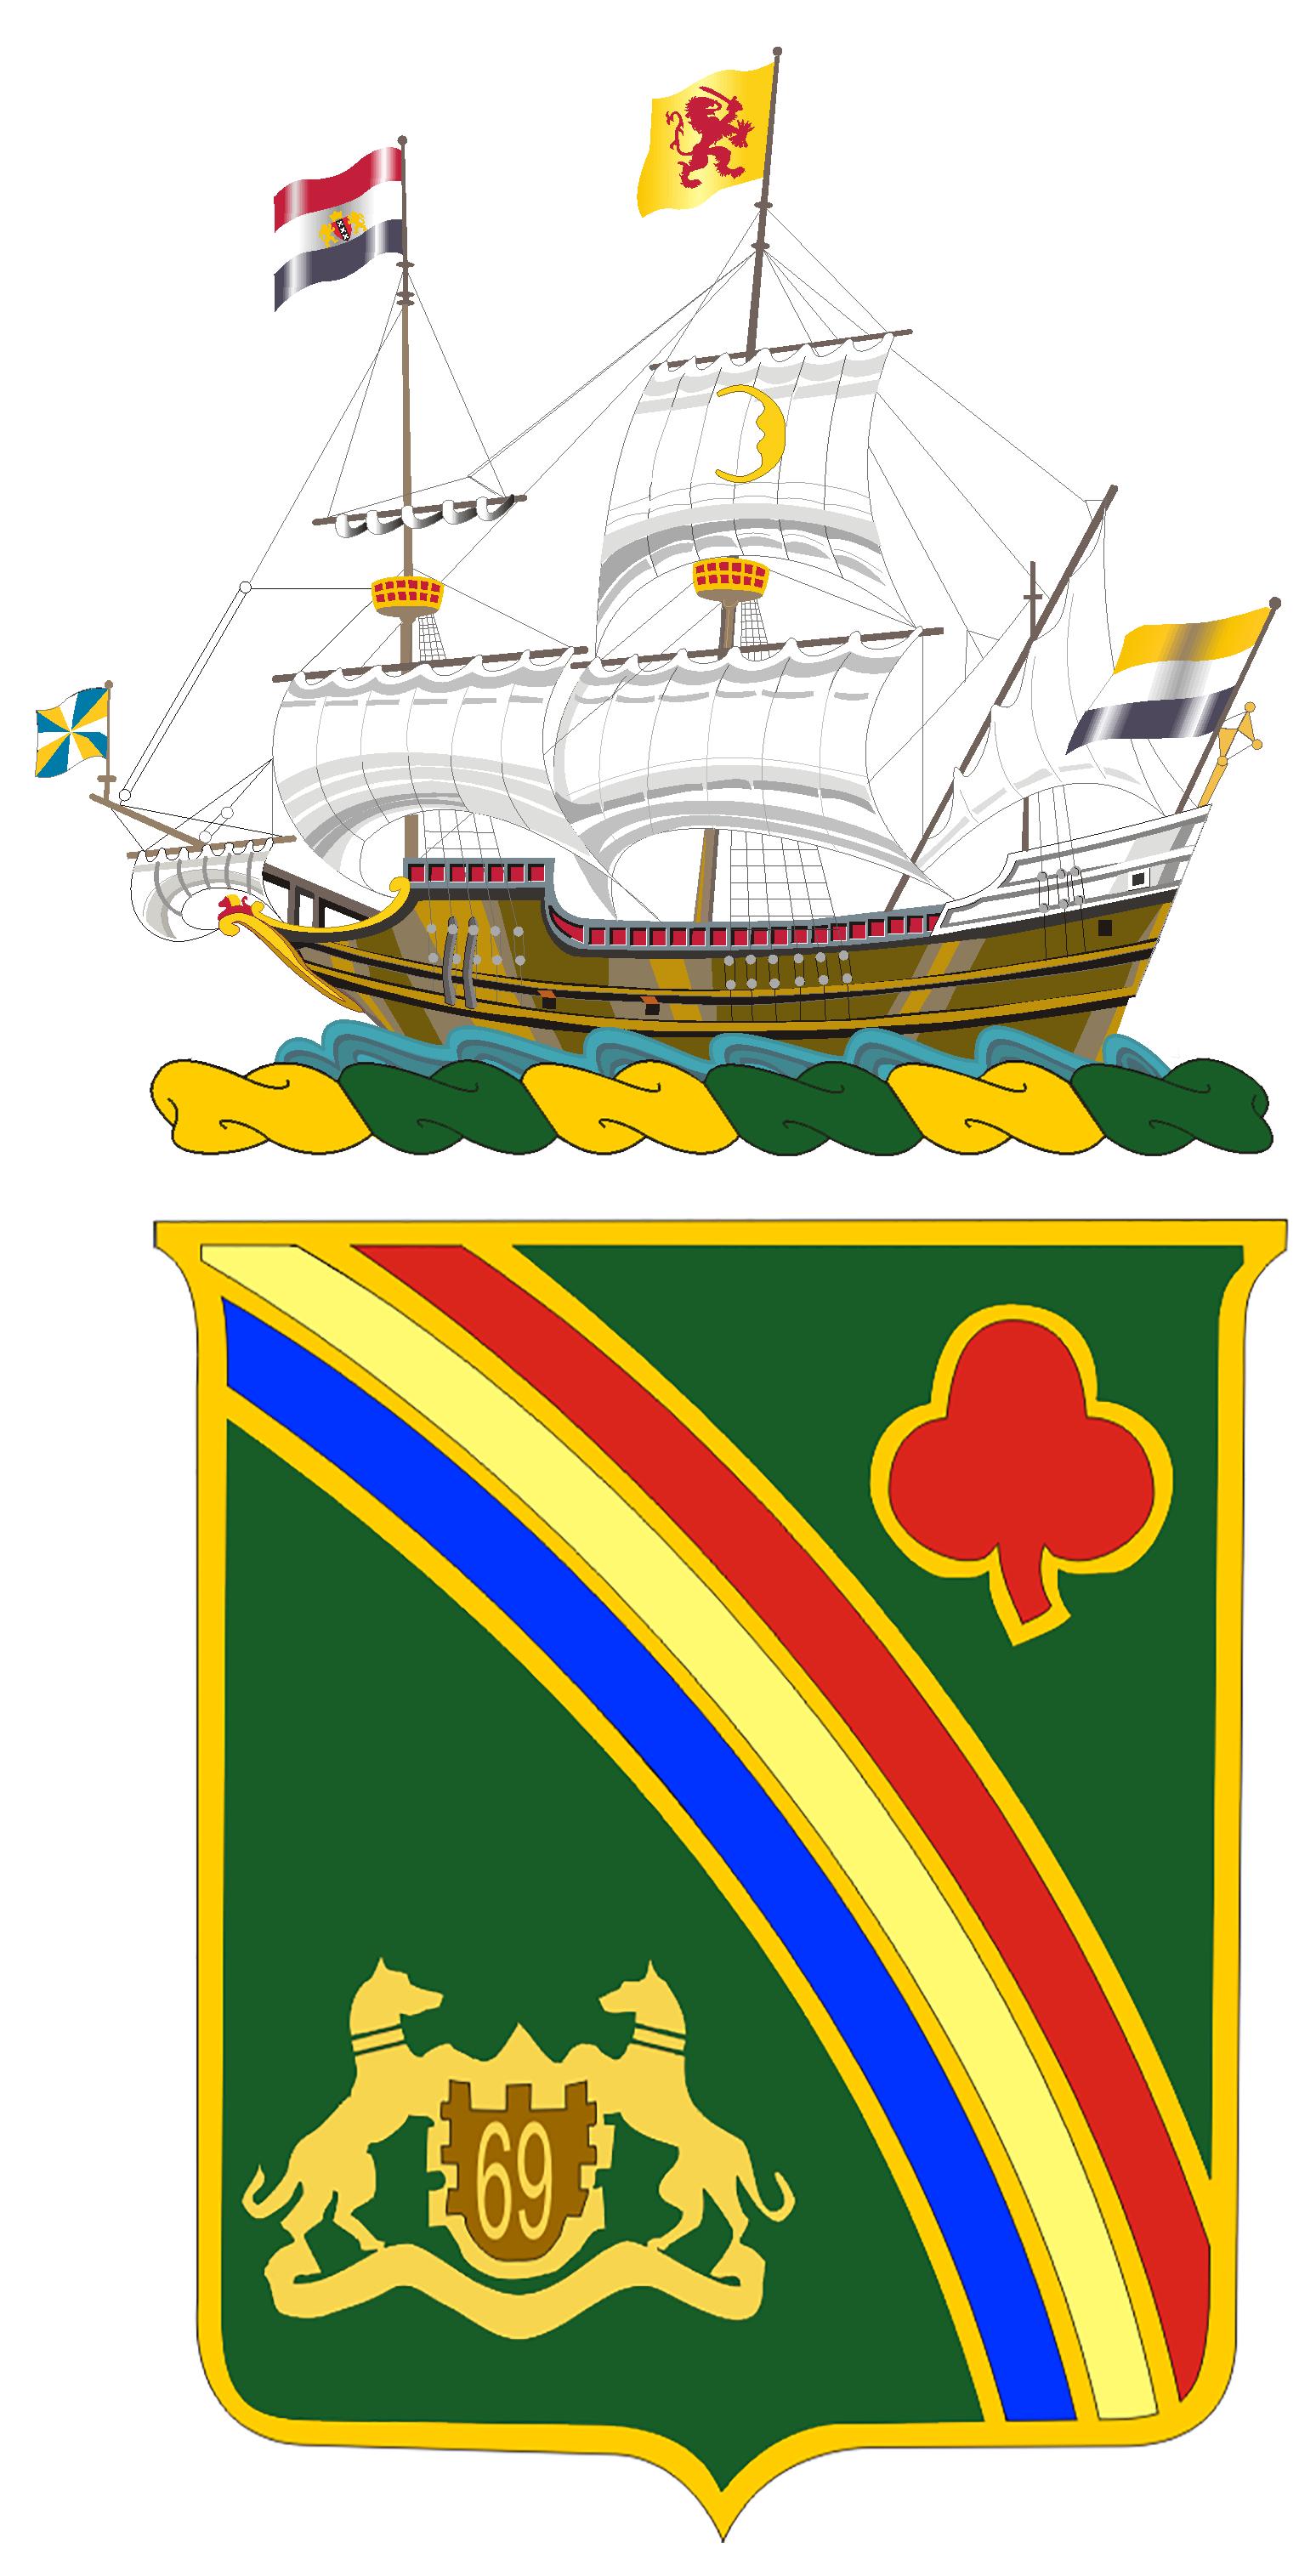 69th New York Infantry Regiment Wikipedia